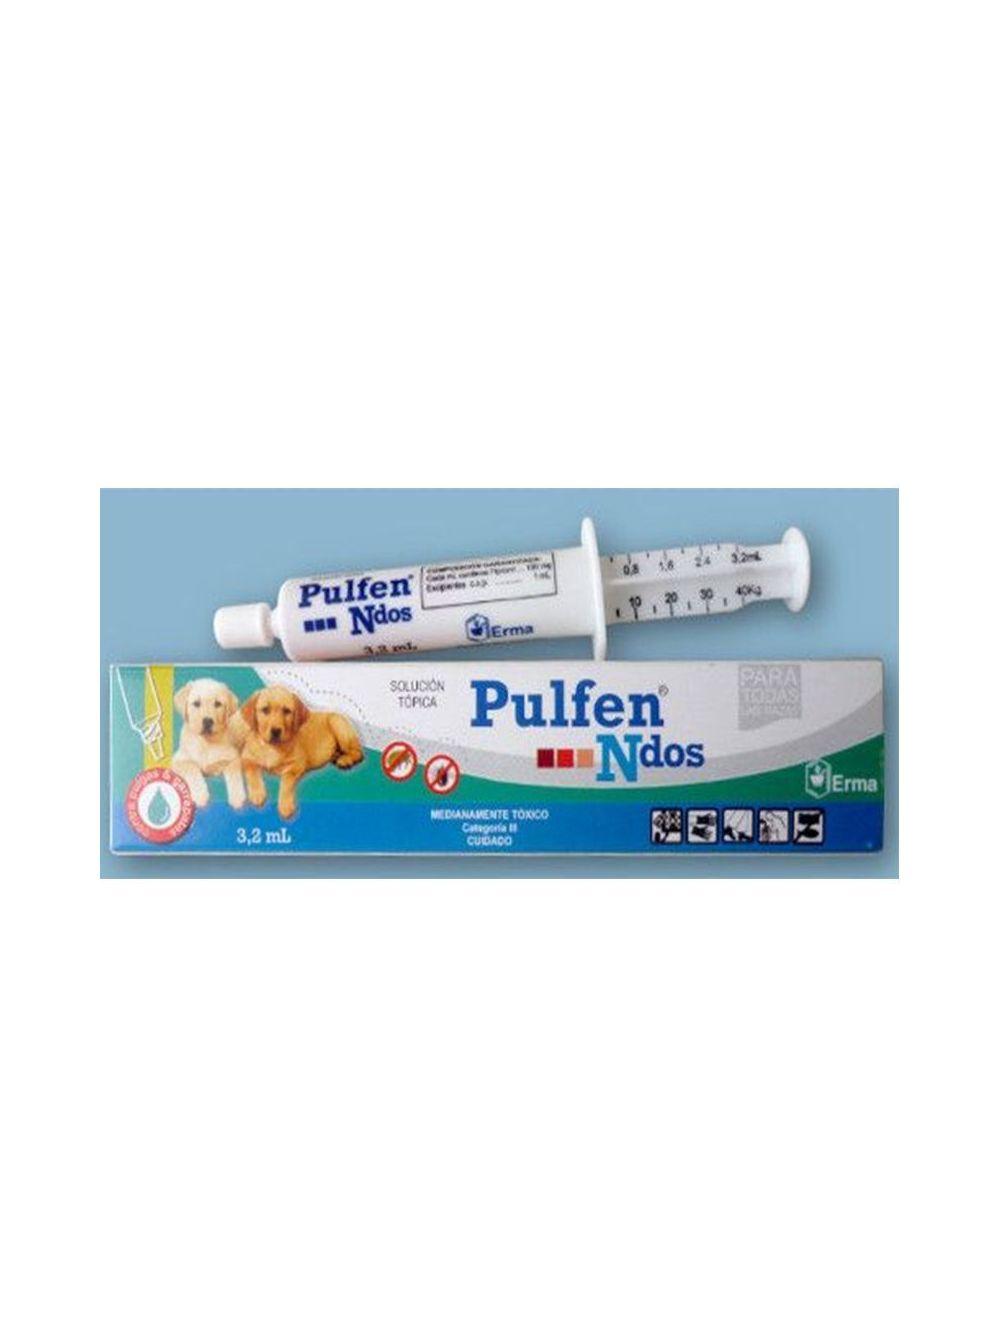 Antipulgas Pulfen Spot On Jeringa 3.2 ML - Ciudaddemascotas.com